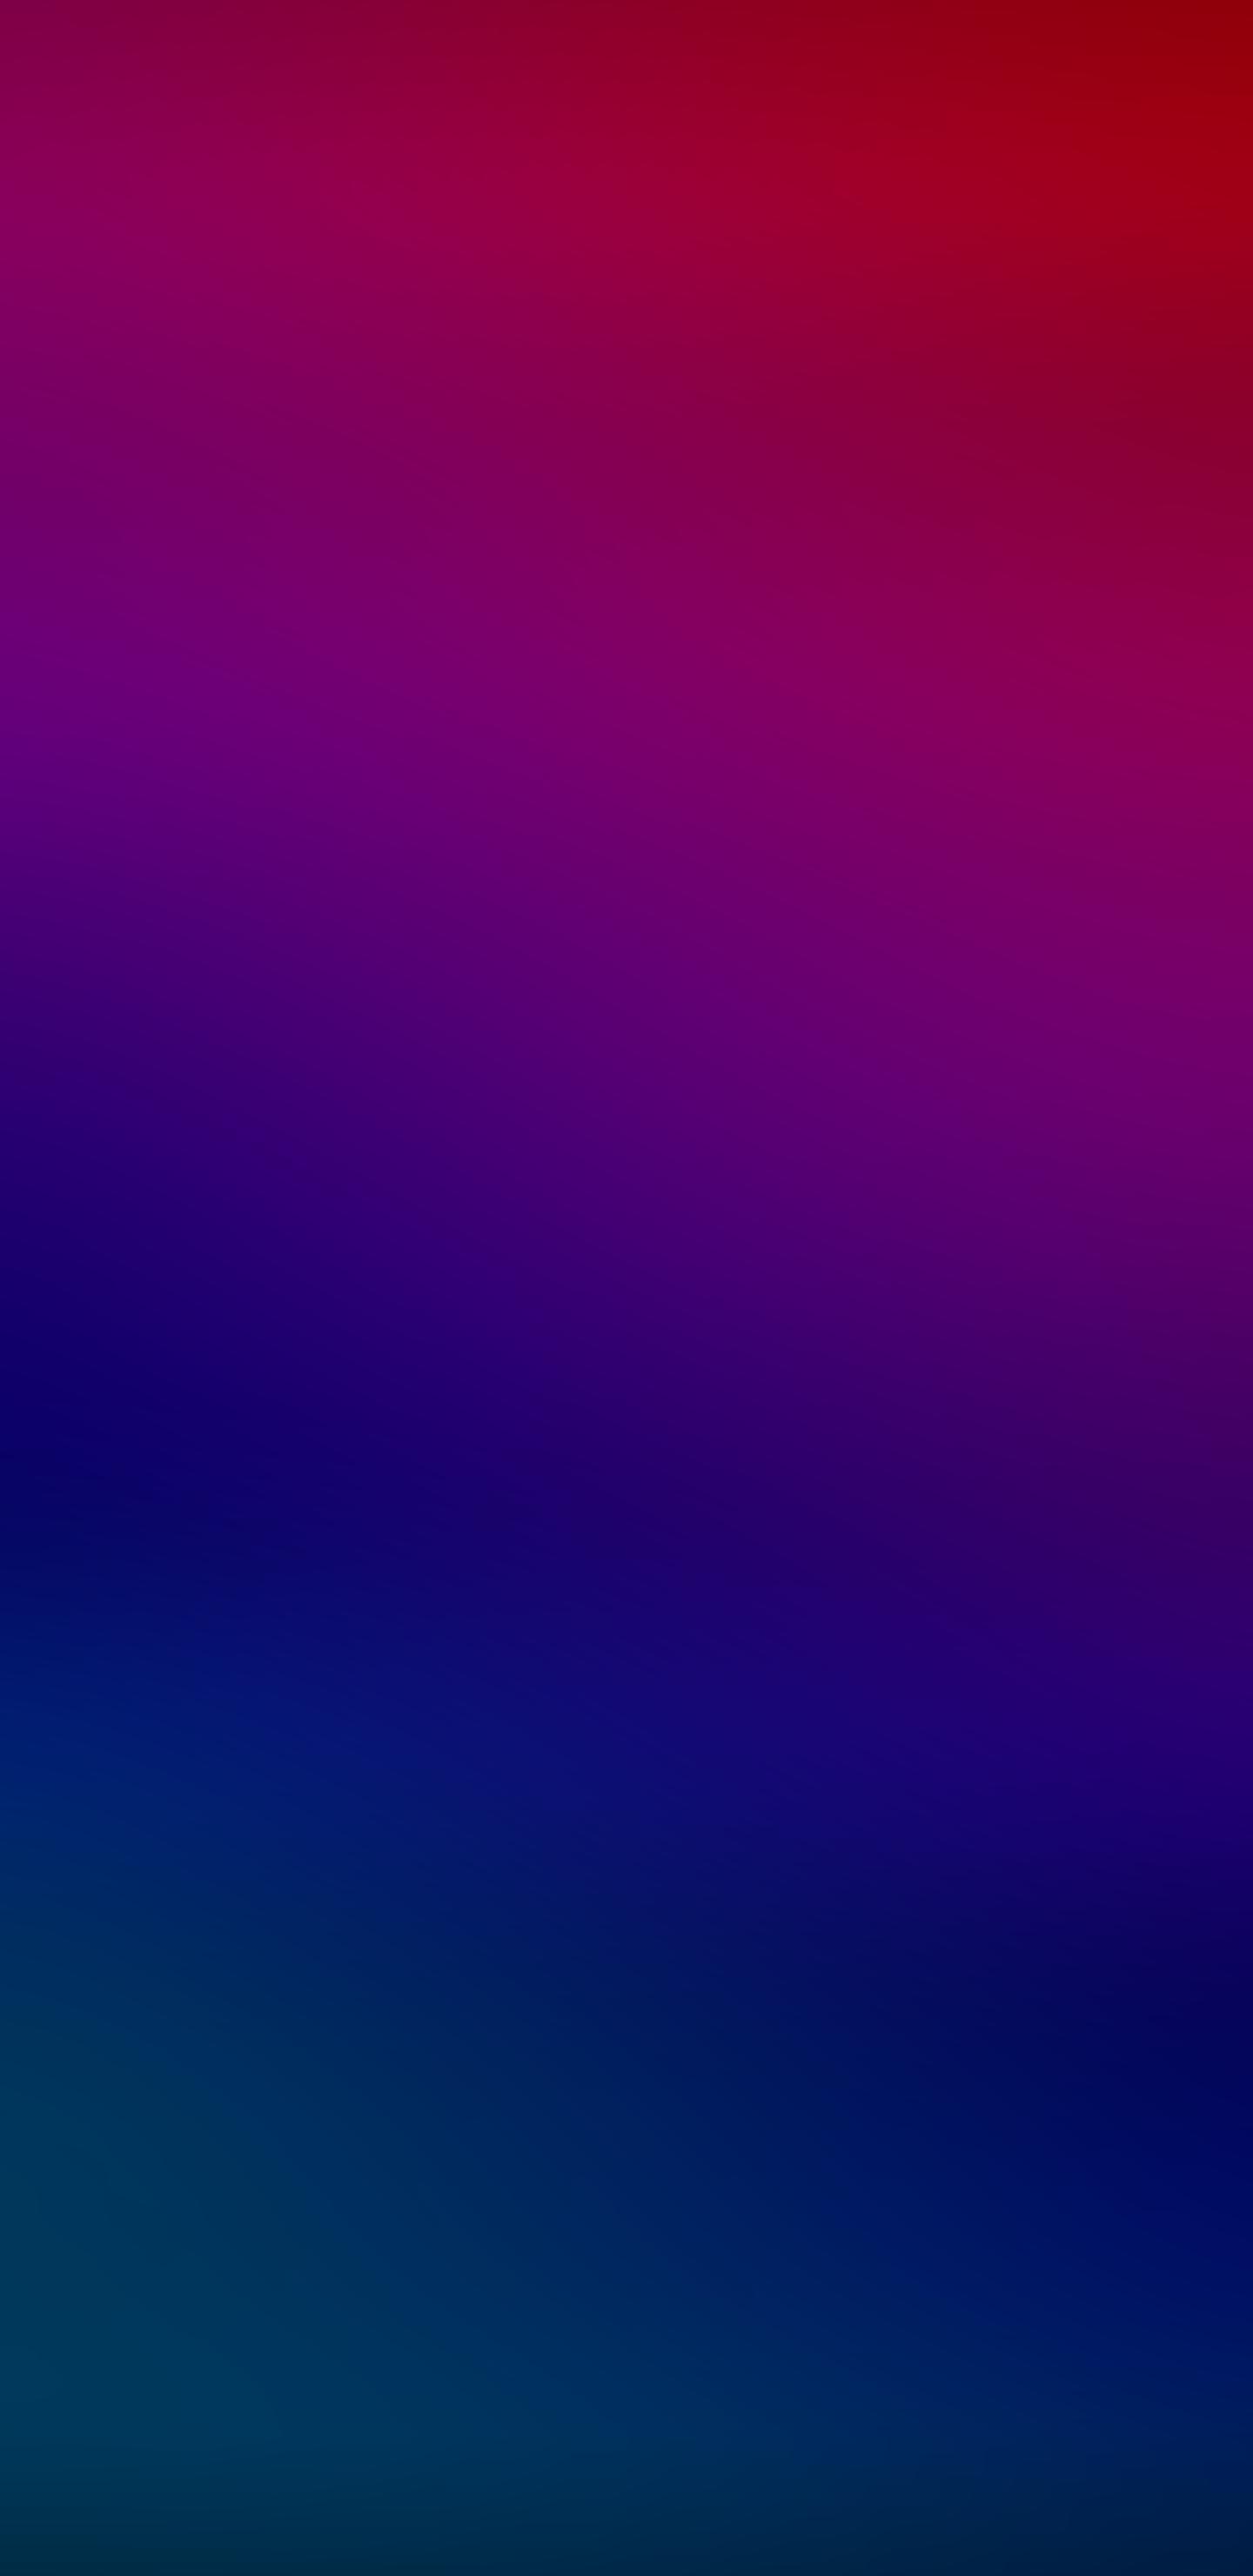 Colorblur Gradient Smart Phone Wallpapers 4kphonewallpapersreddit Iphonewallpapersreddit Redditwallpapers Tardis Blue Hex Colors Pantone